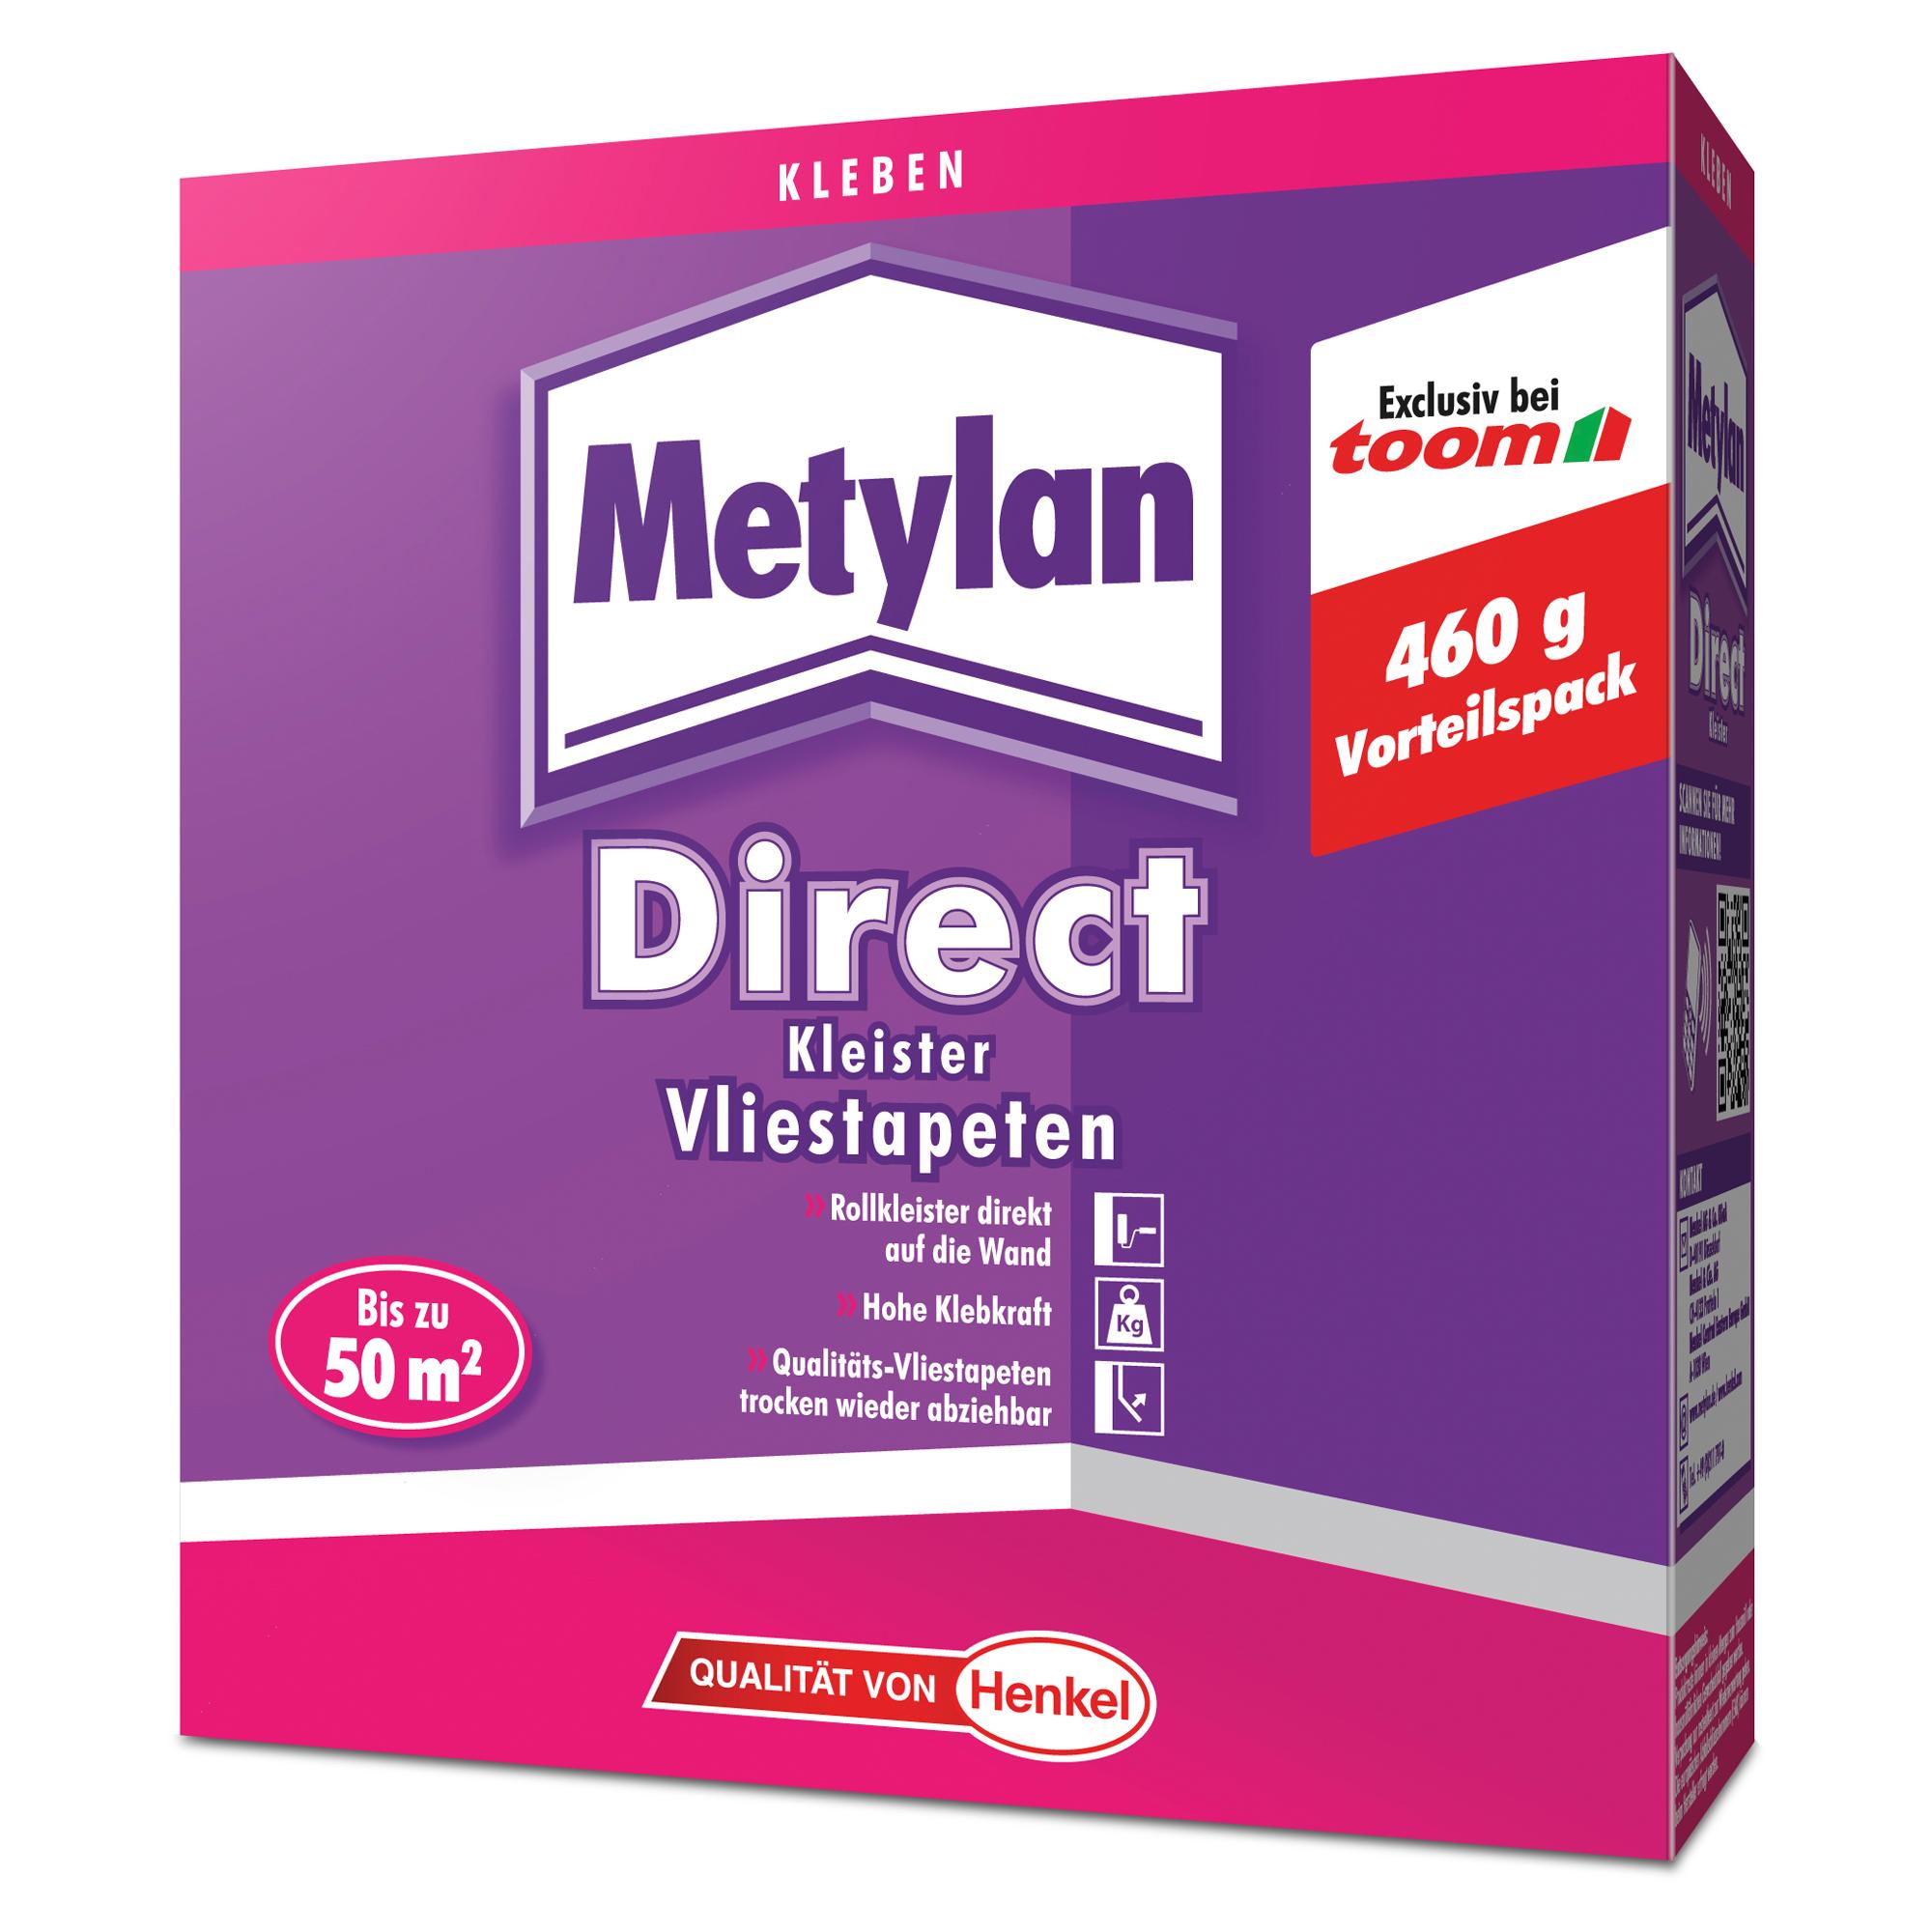 Toom Vliestapetenkleister Direct 460 G ǀ Toom Baumarkt